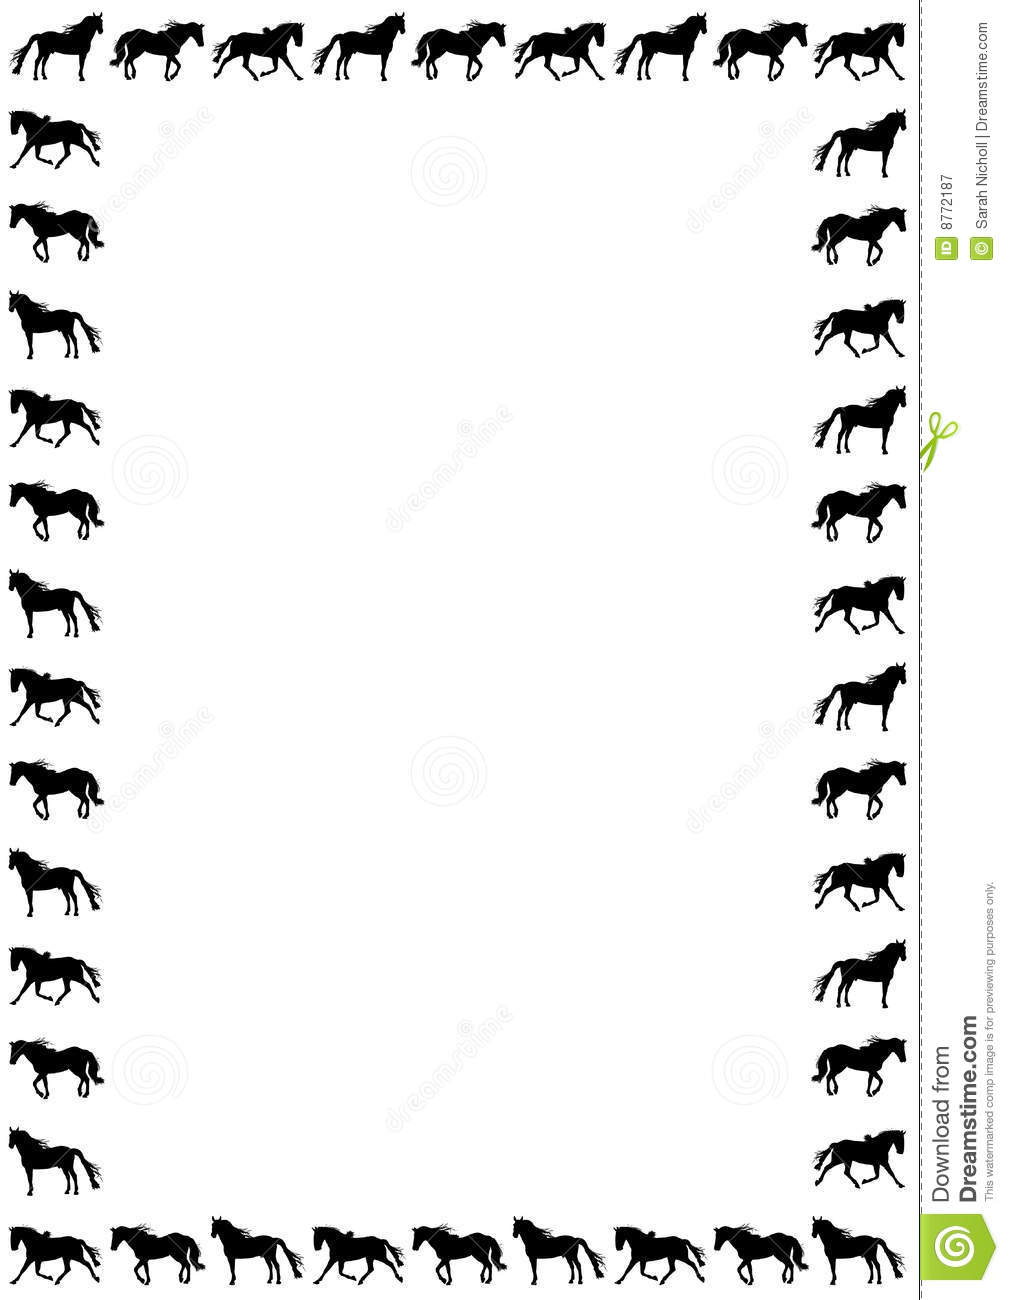 Frame clipart horse Art Clip and horse Horse